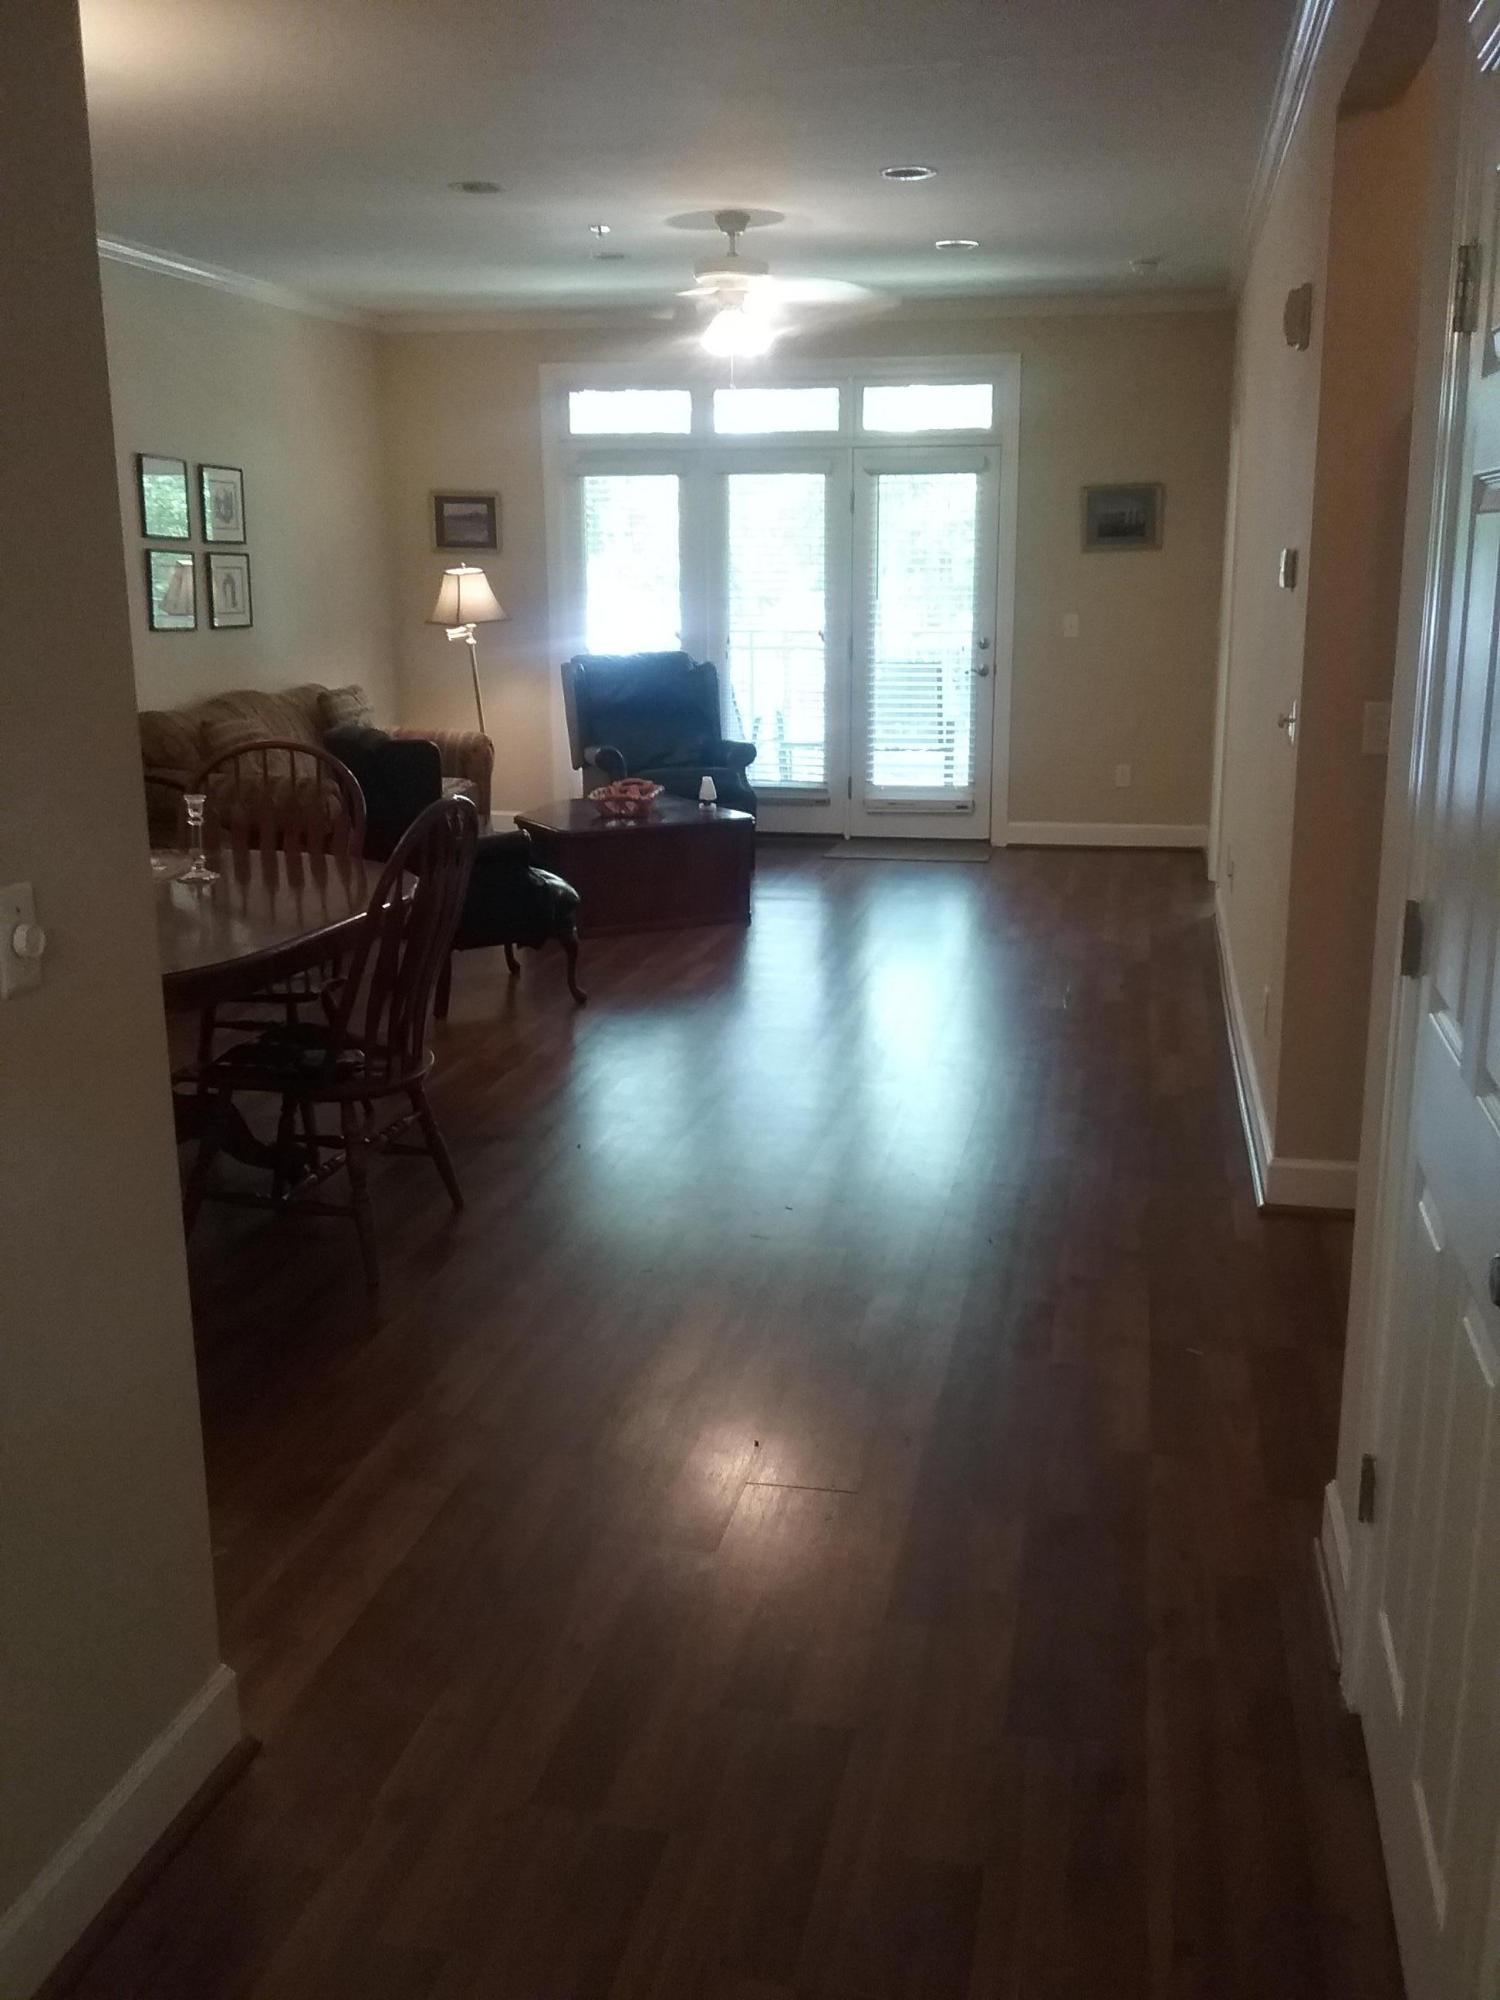 Ballards Pointe II Homes For Sale - 103 Ballard, Santee, SC - 1